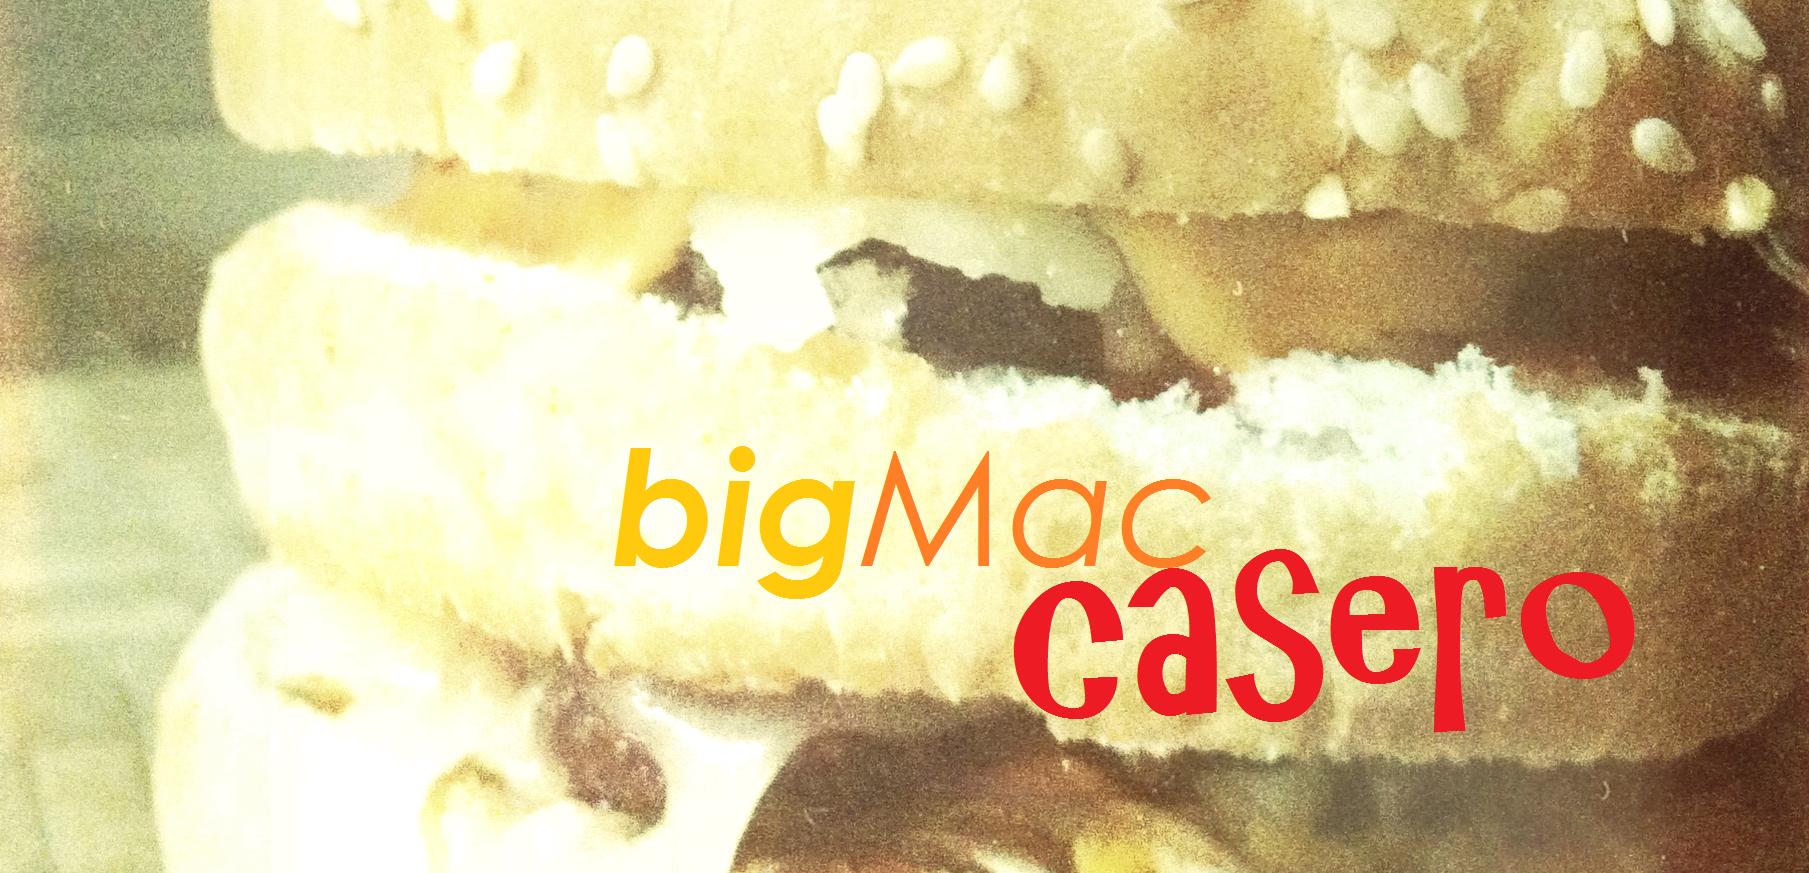 BigMCS Caseras X $22 Mangos